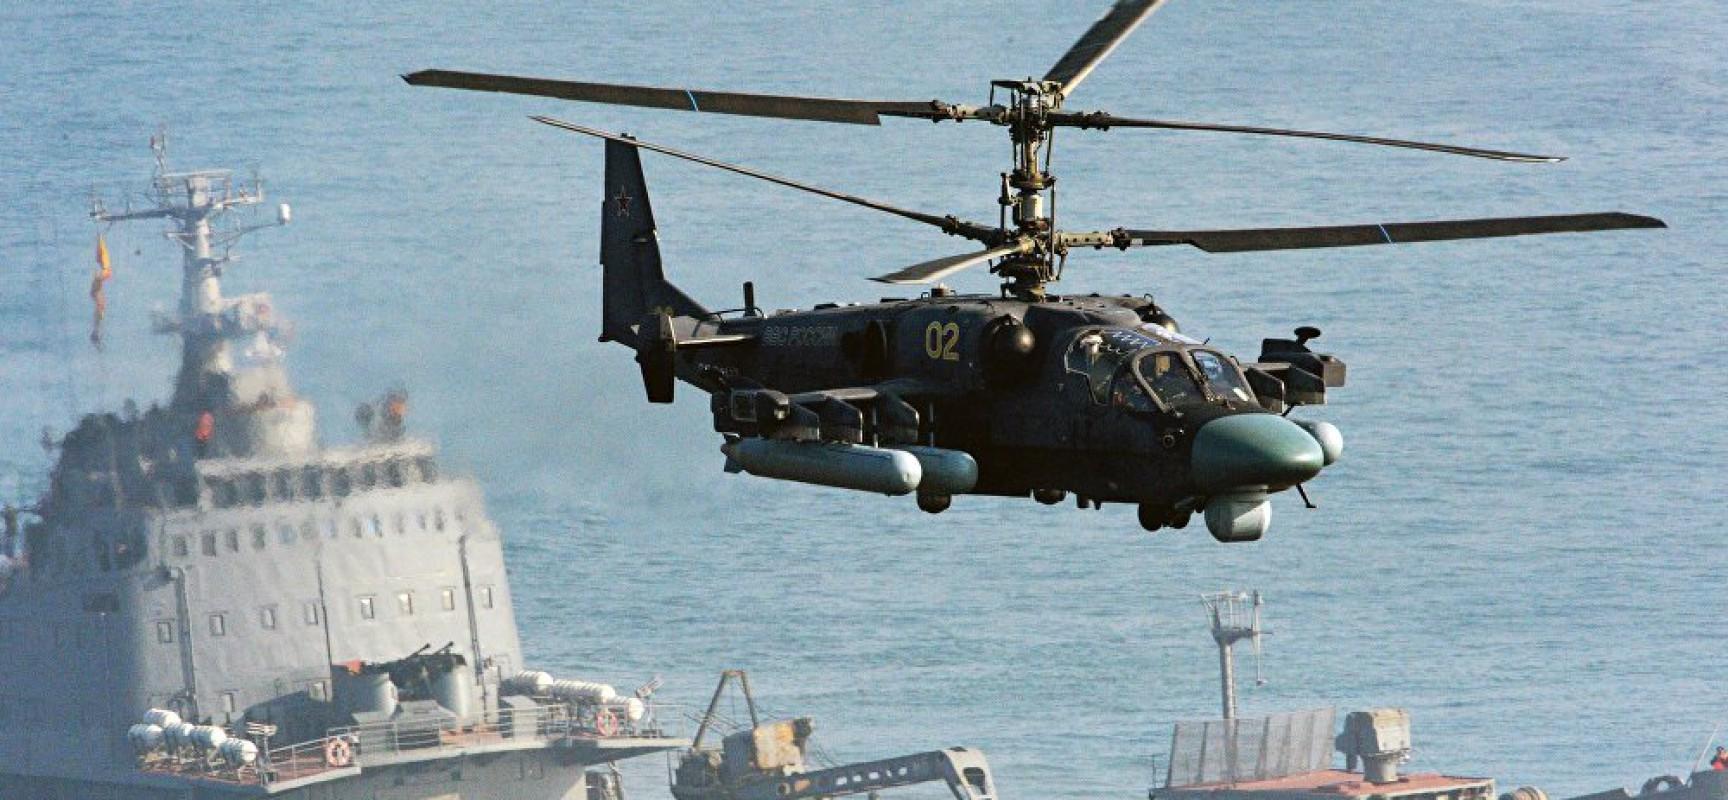 Les Alligator russes seront embarqués sur les Mistral égyptiens